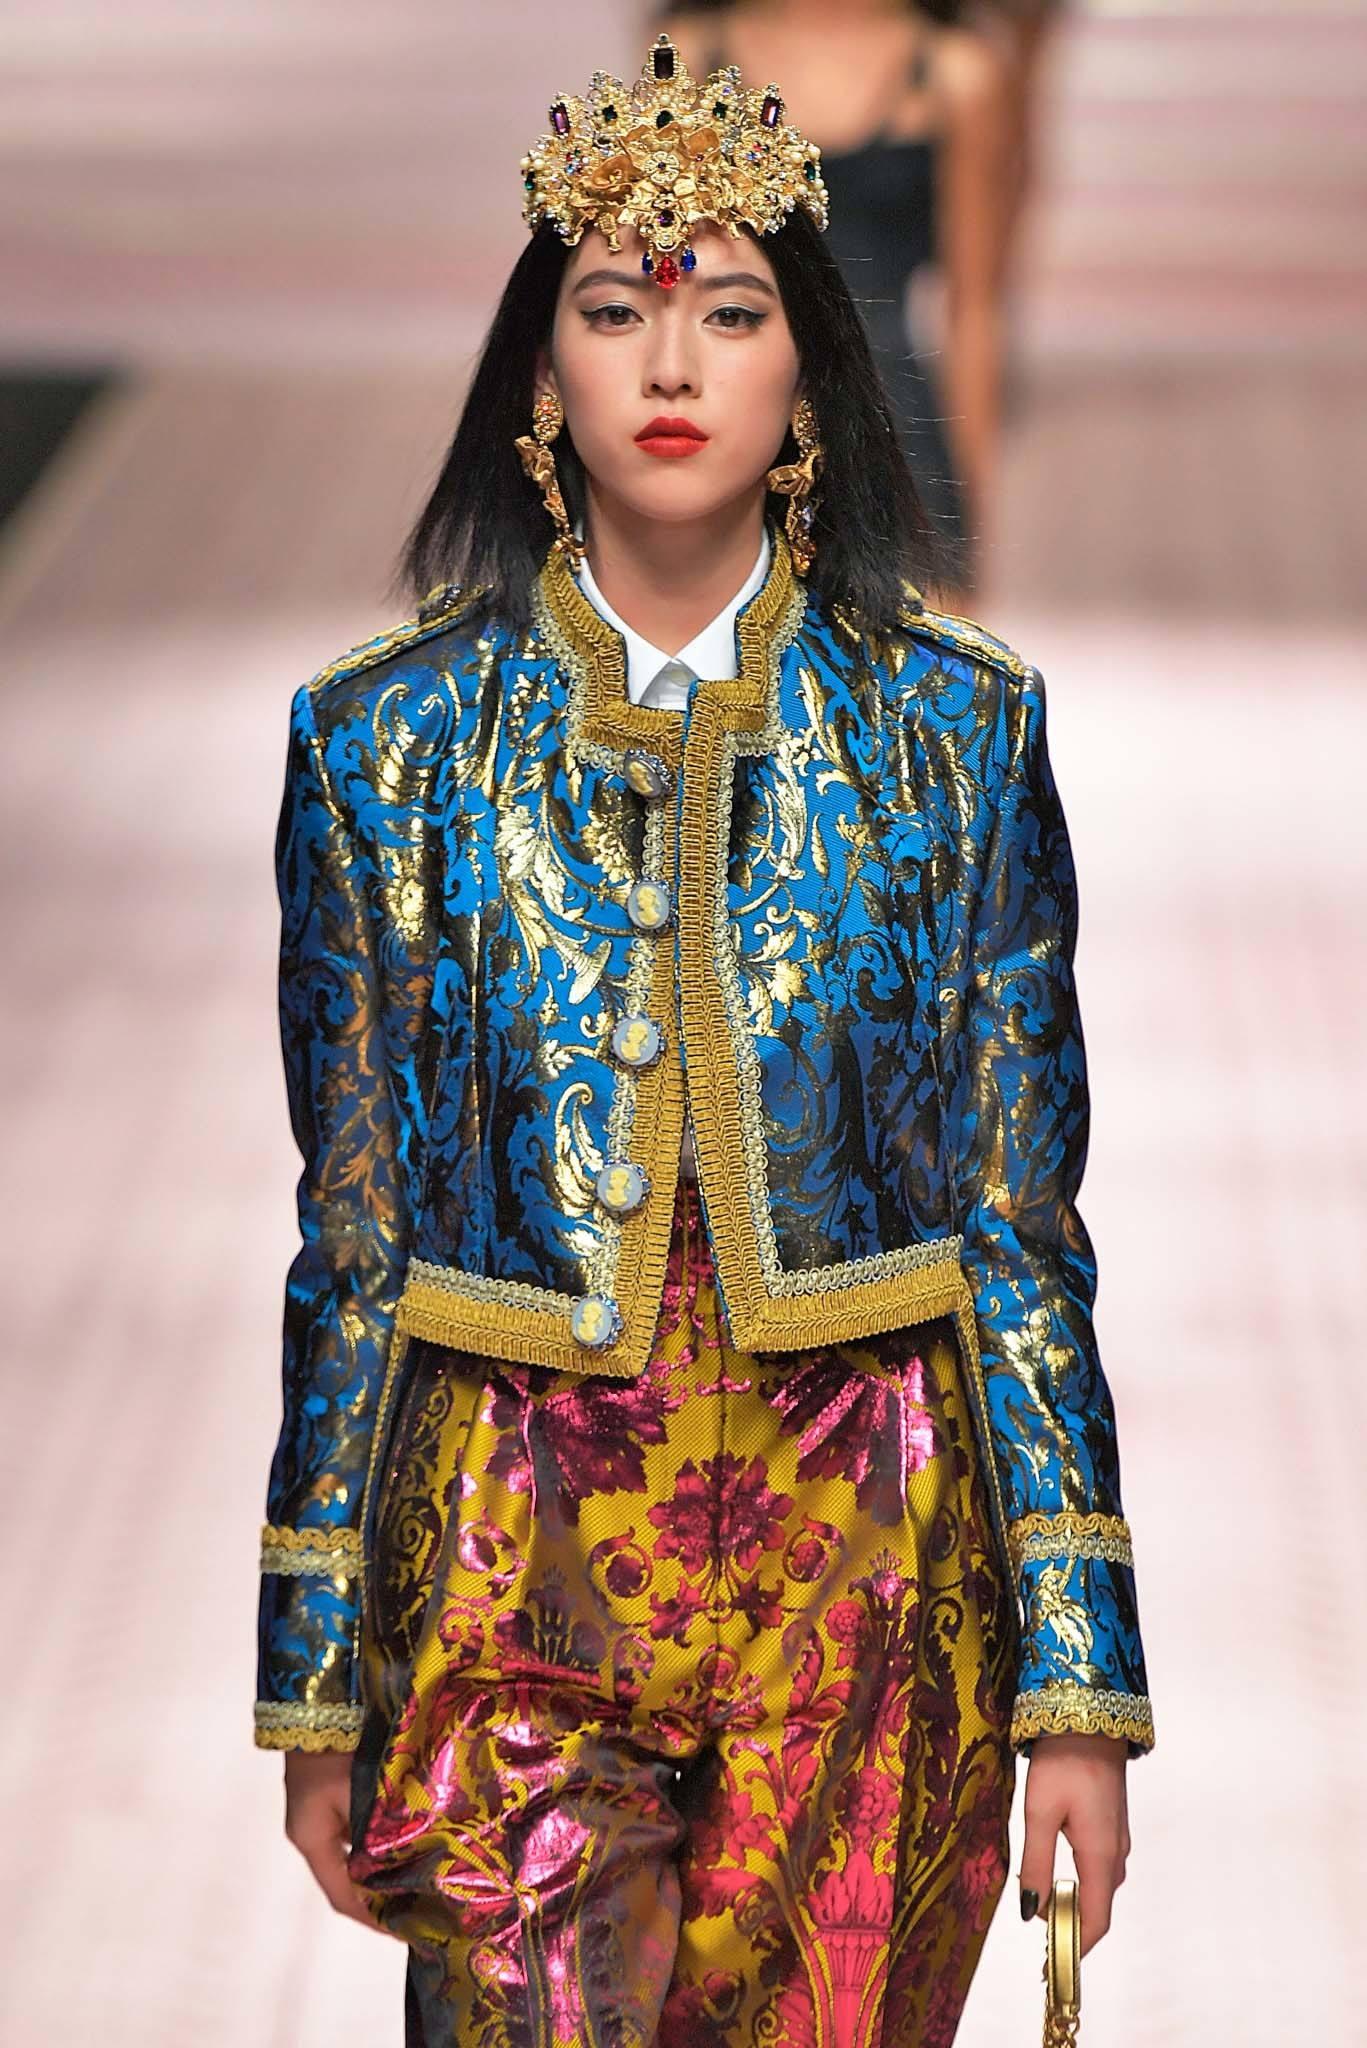 Headband and bandana hairstyles: Woman on Dolce and Gabbana SS19 runway with straight dark brown medium hair wearing a gold tiara OTT headband.